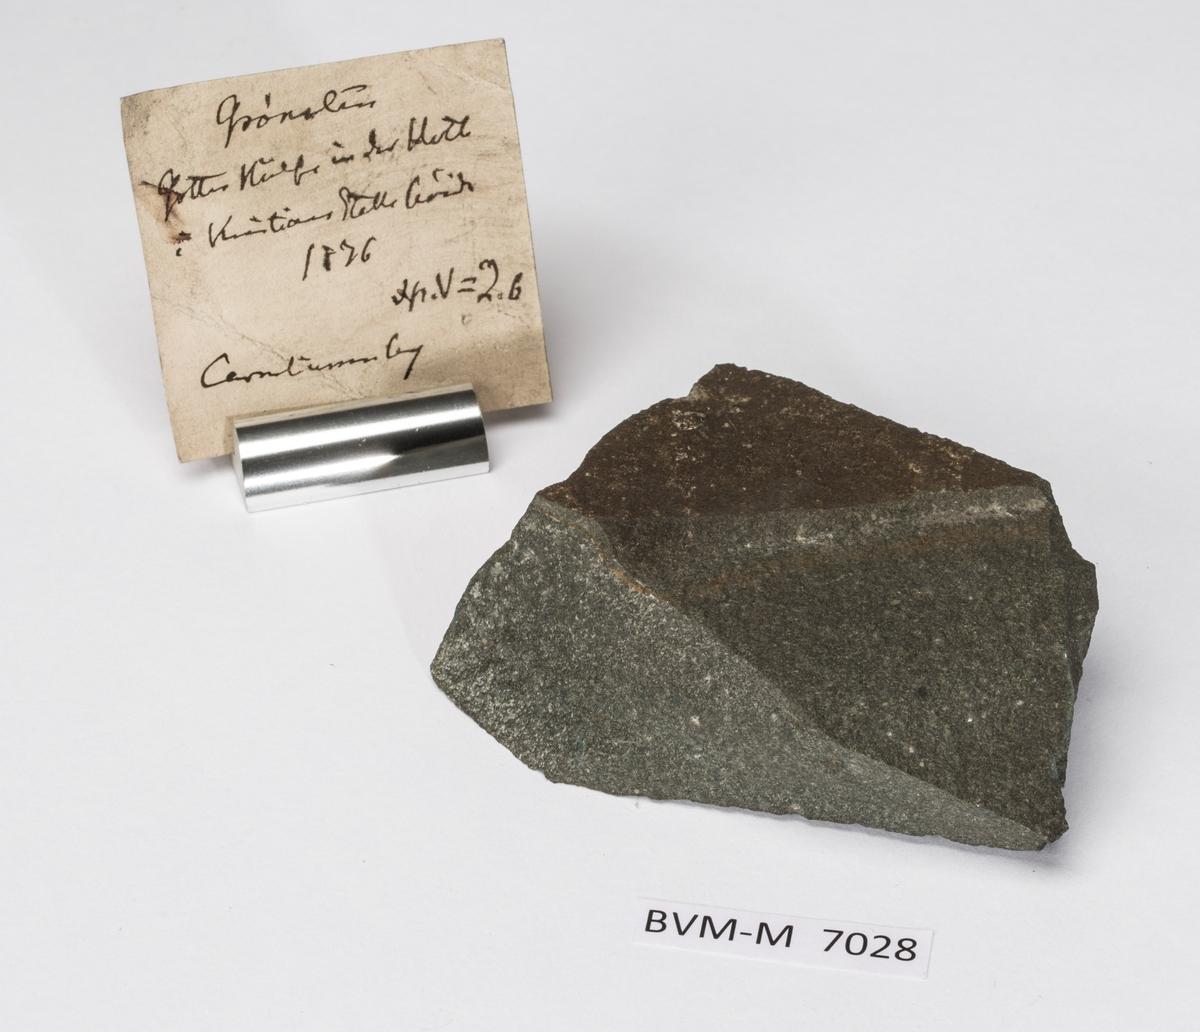 En etikett i eske: Grønsten Gottes Hülfe in der Noth  i Kristians Stolle høide 1876 Sp.V=2.6 Corneliussen leg